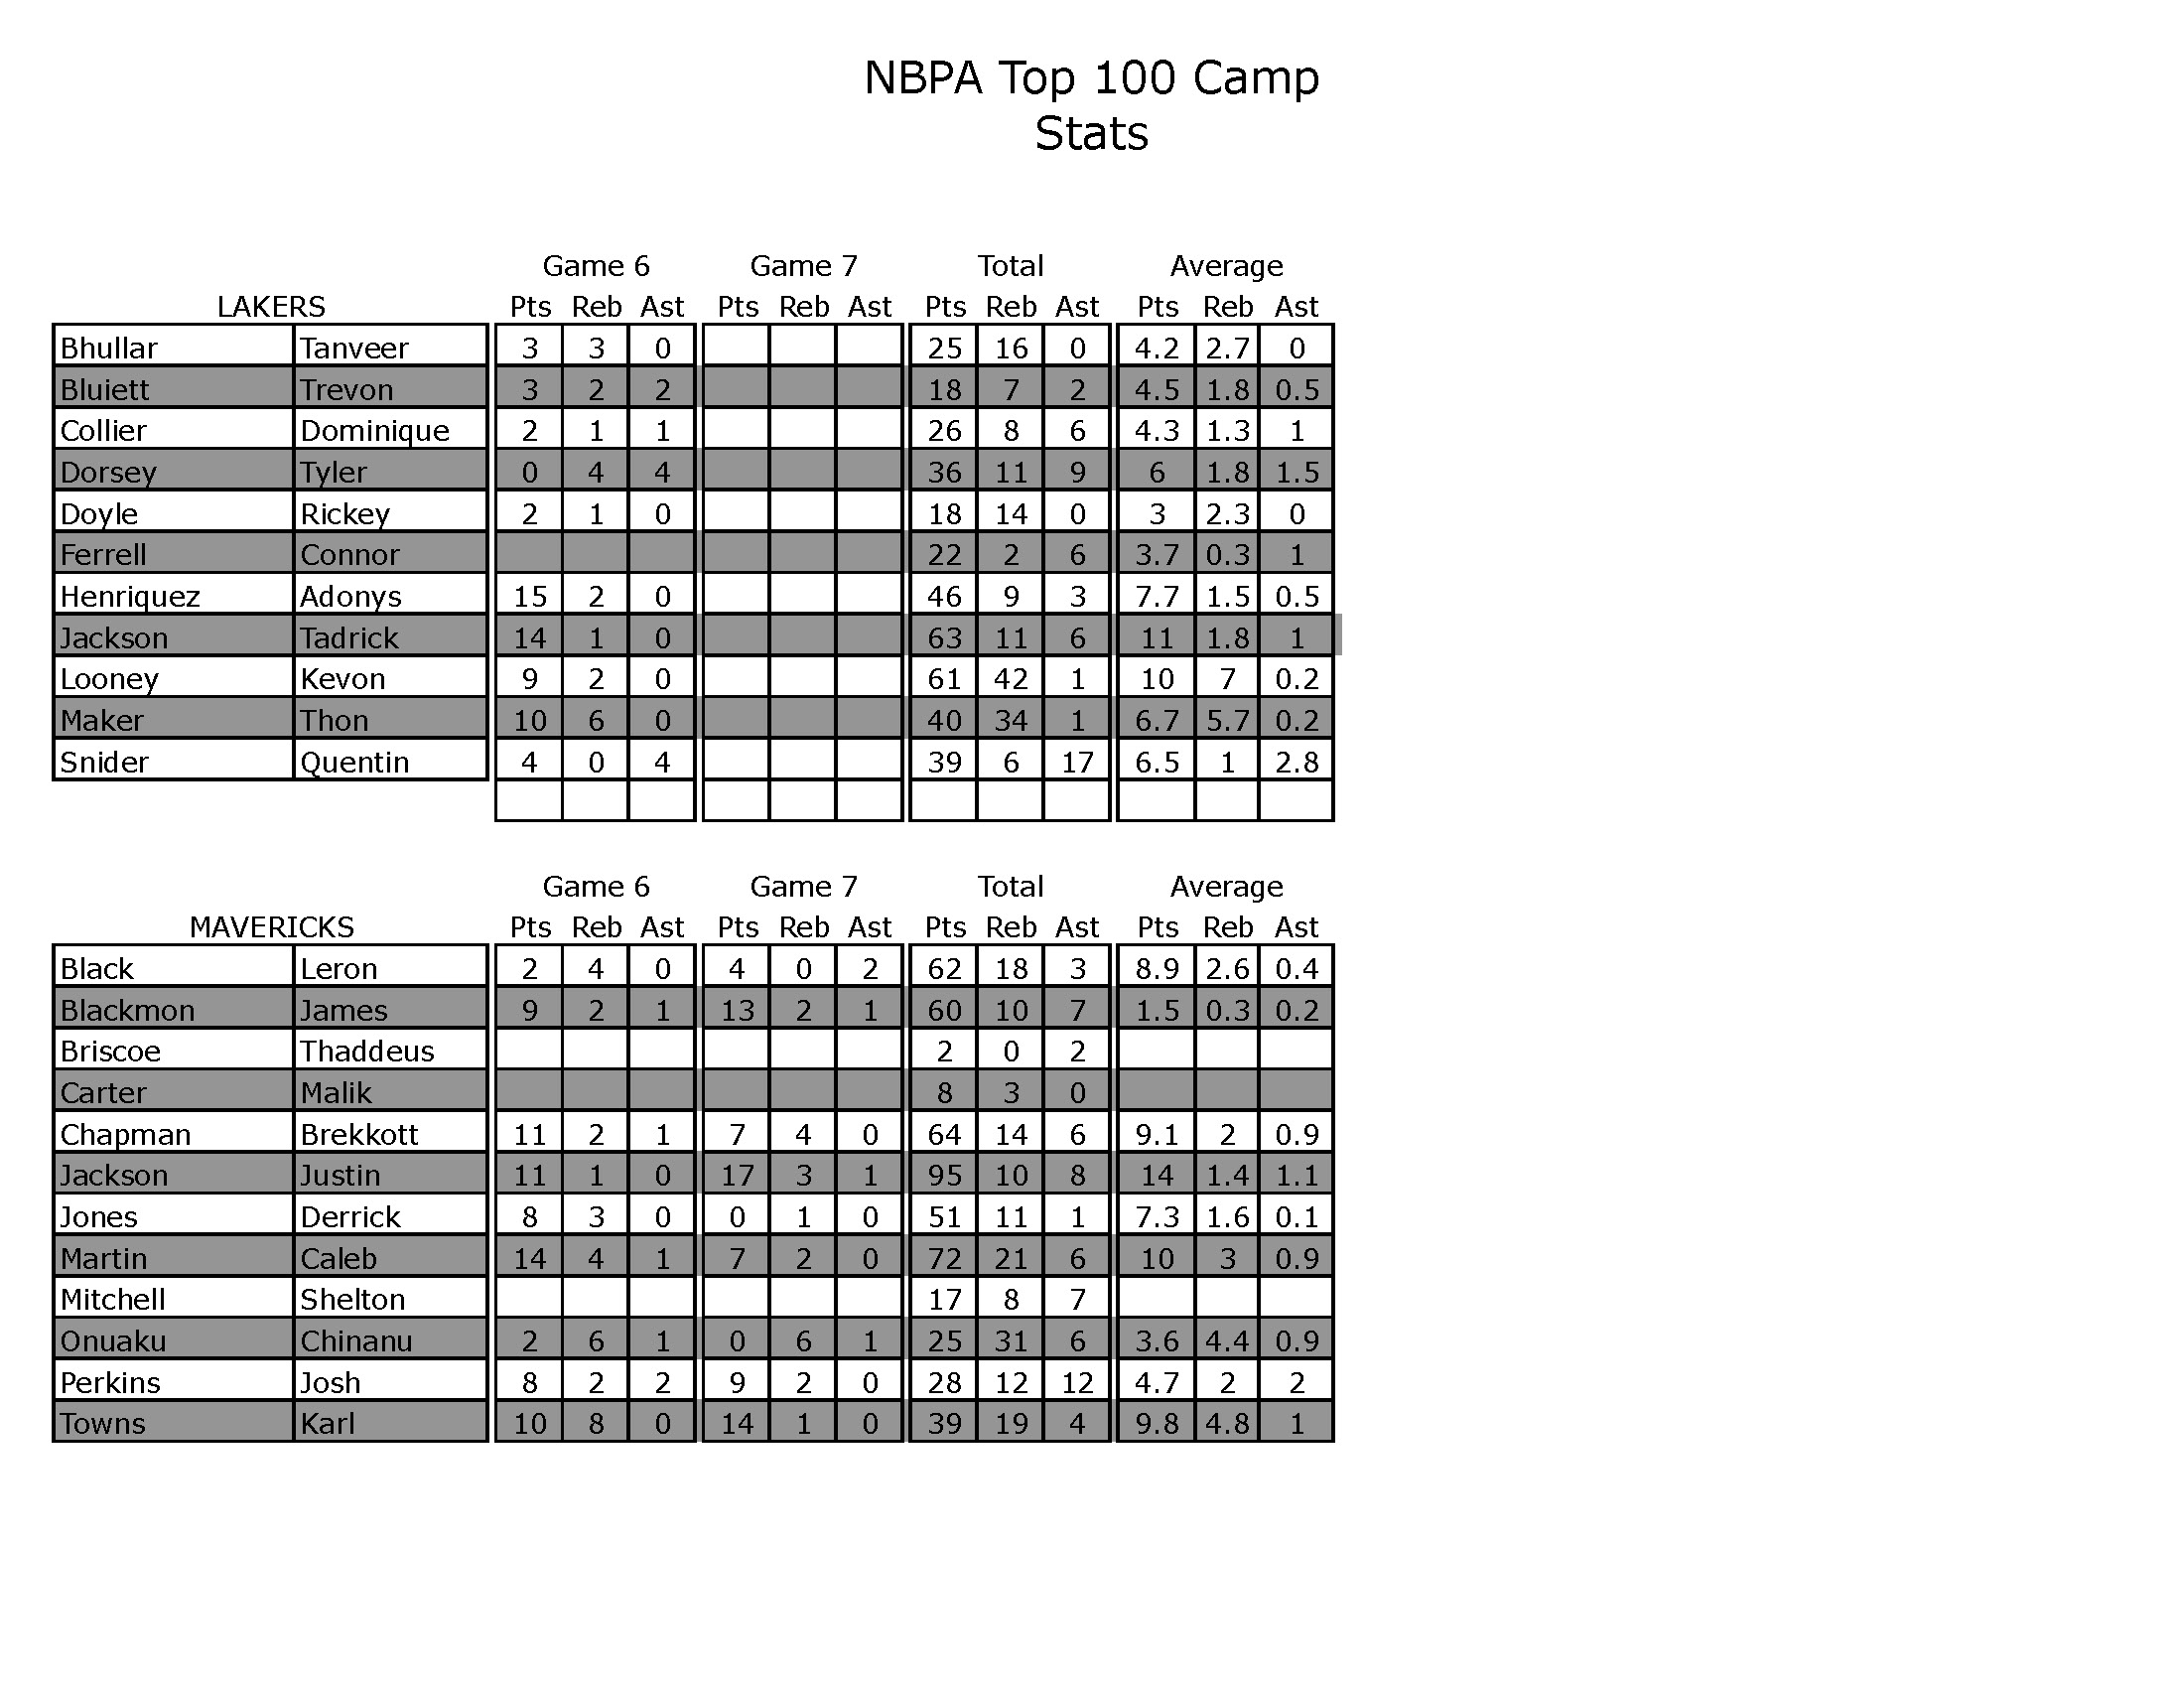 NBPA STATS FINAL_Page_8